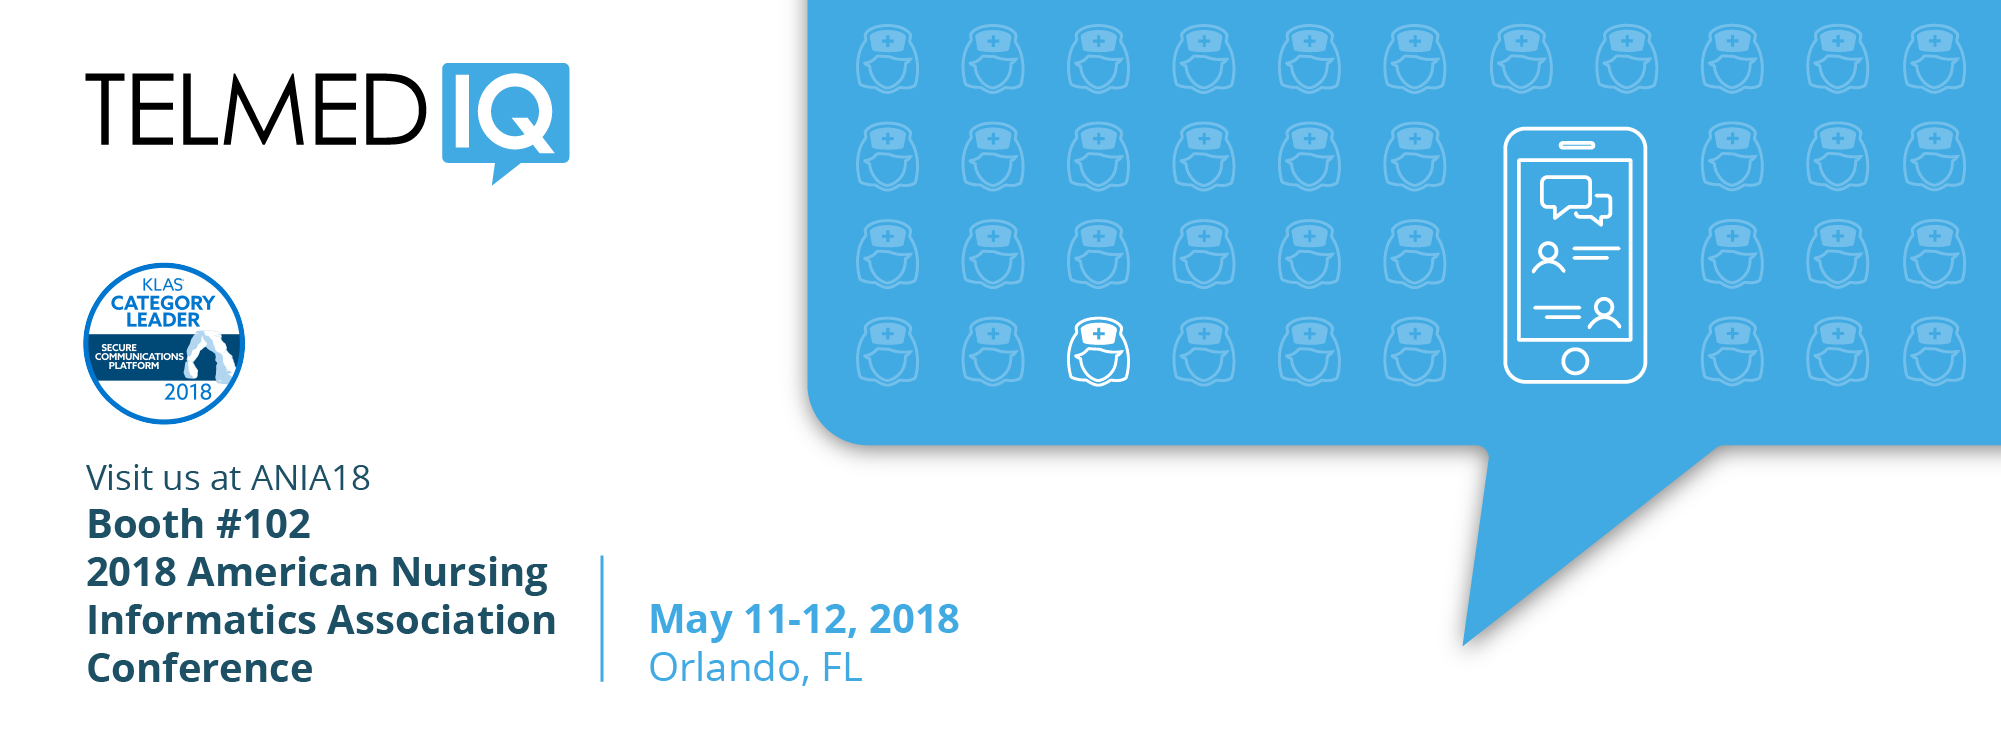 Join Telmediq at the ANIA Annual Conference in Orlando